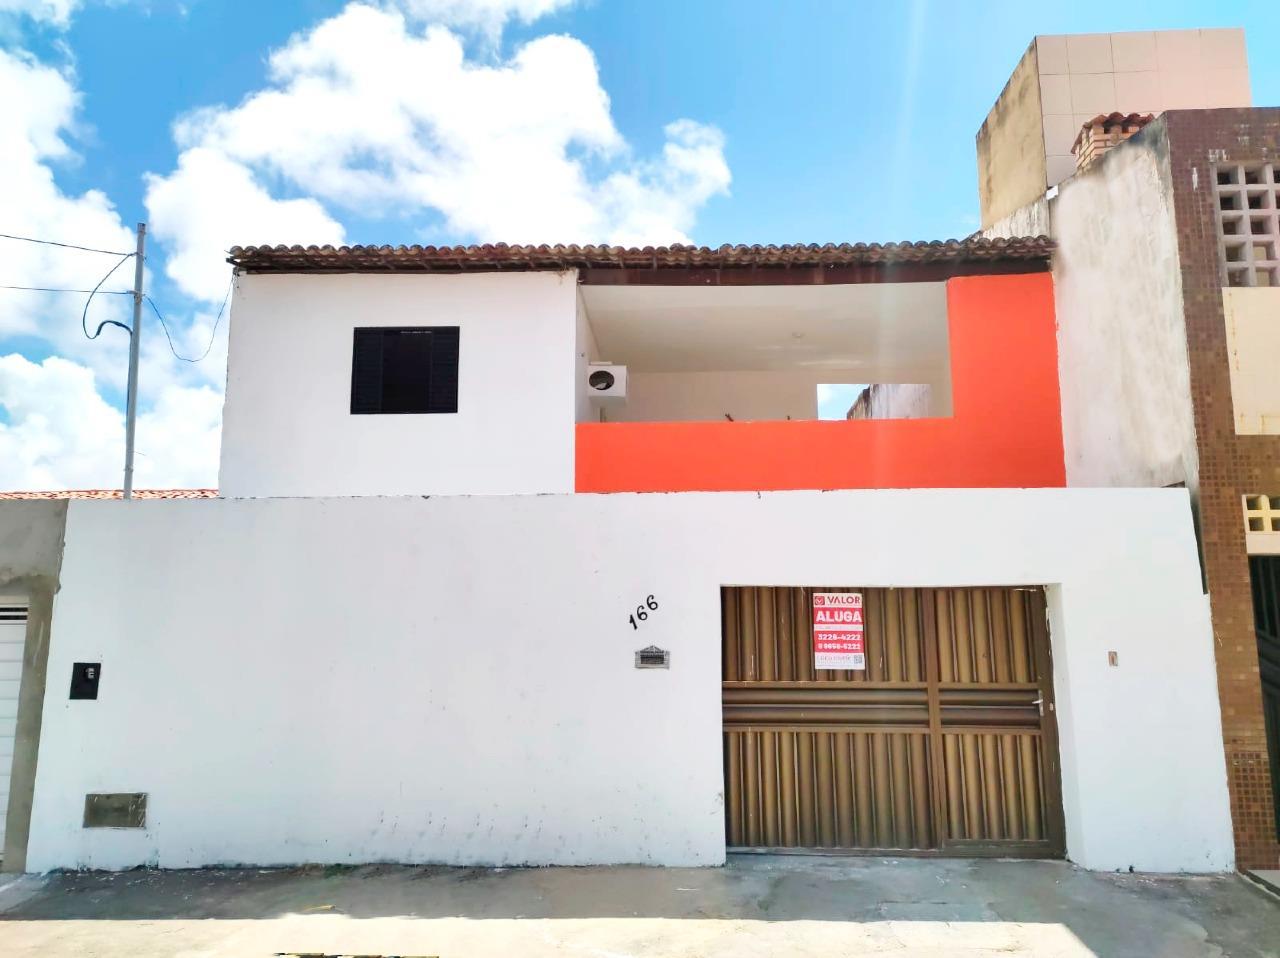 Casa para aluguel, 4 quartos, 1 suíte, 2 vagas, Farolândia - Aracaju/SE